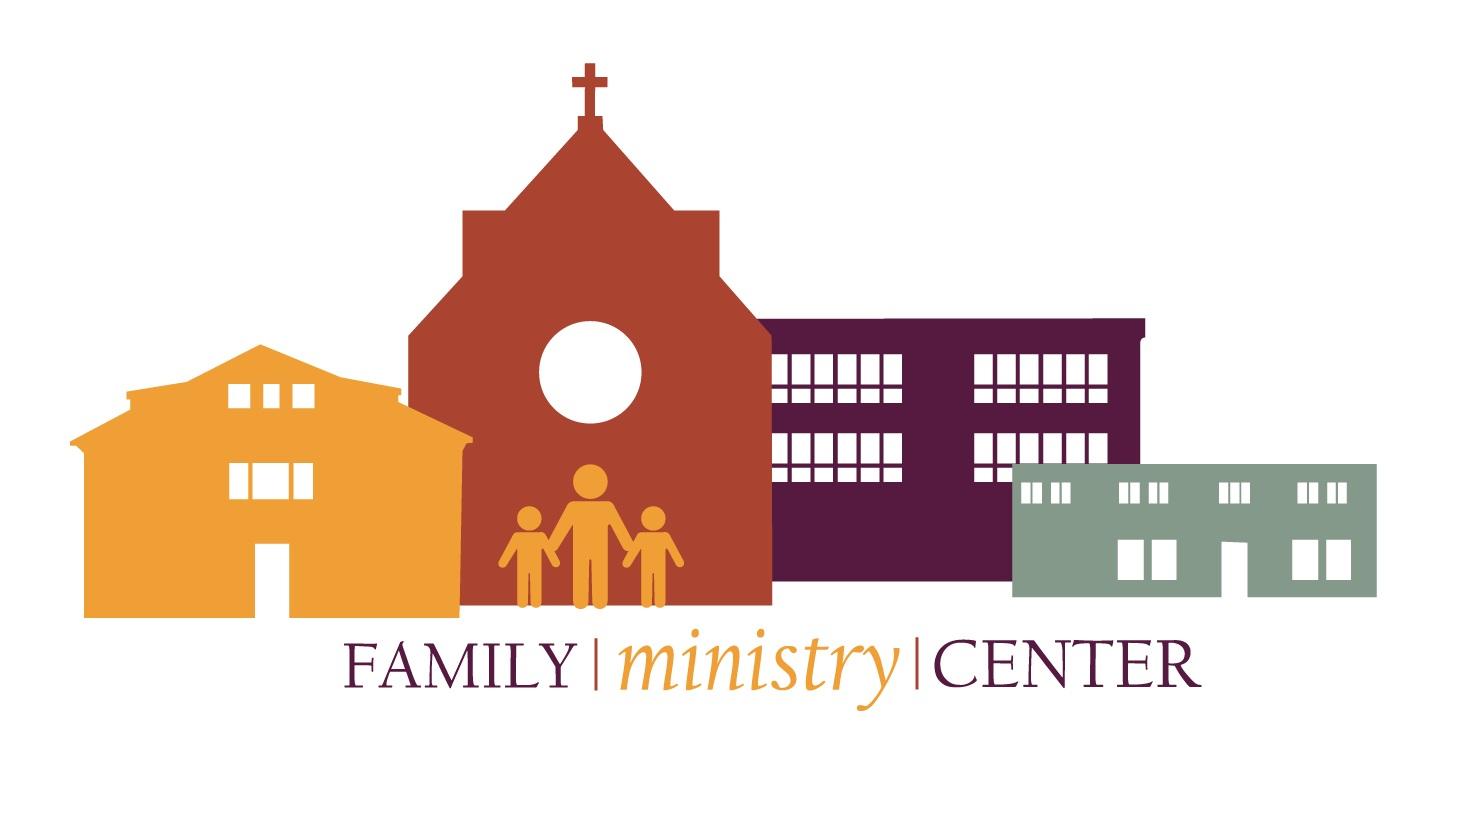 FMC.logo.jpg